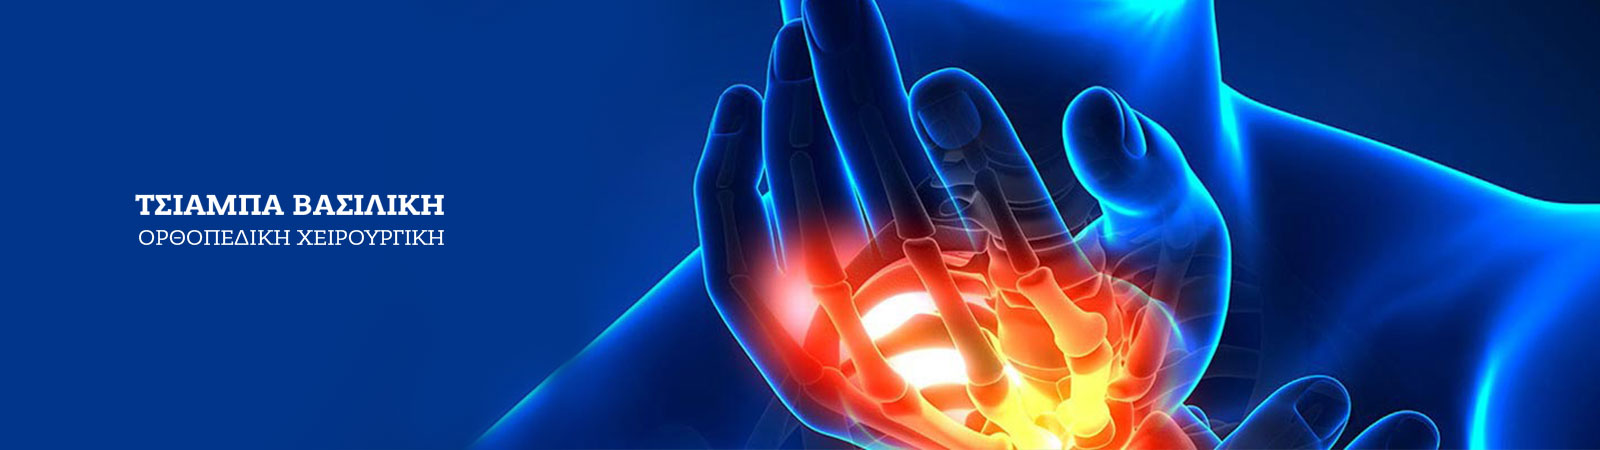 Xειρουργική Άκρας Χειρός – Χειρουργική Τετραπληγίας